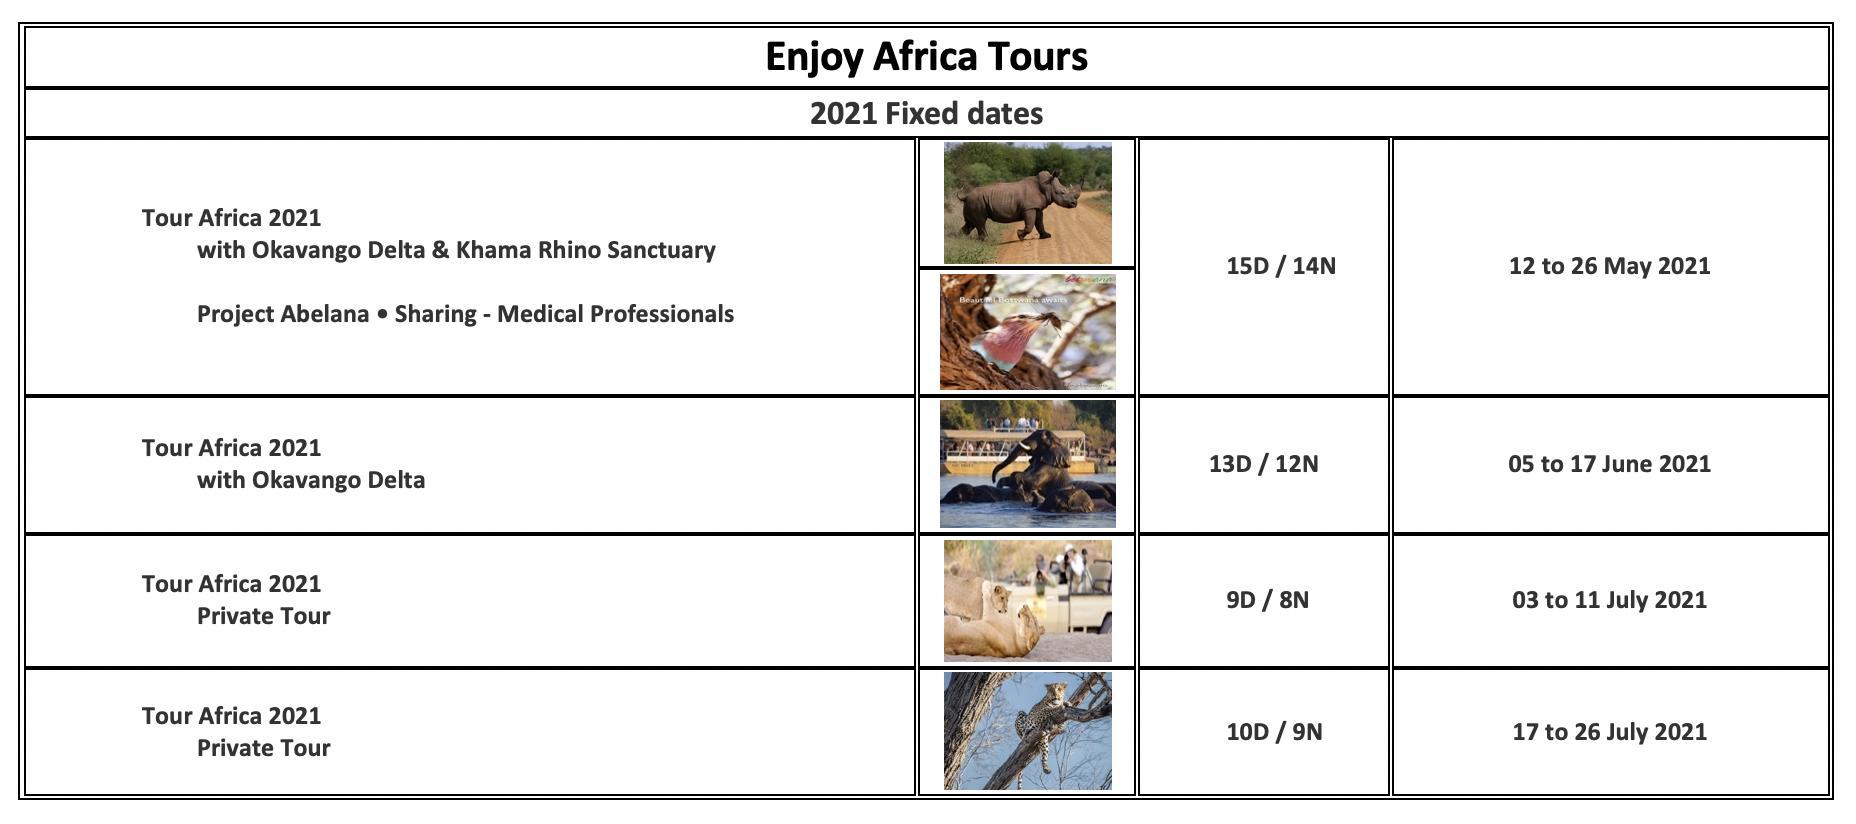 Enjoy Africa Tours 2021